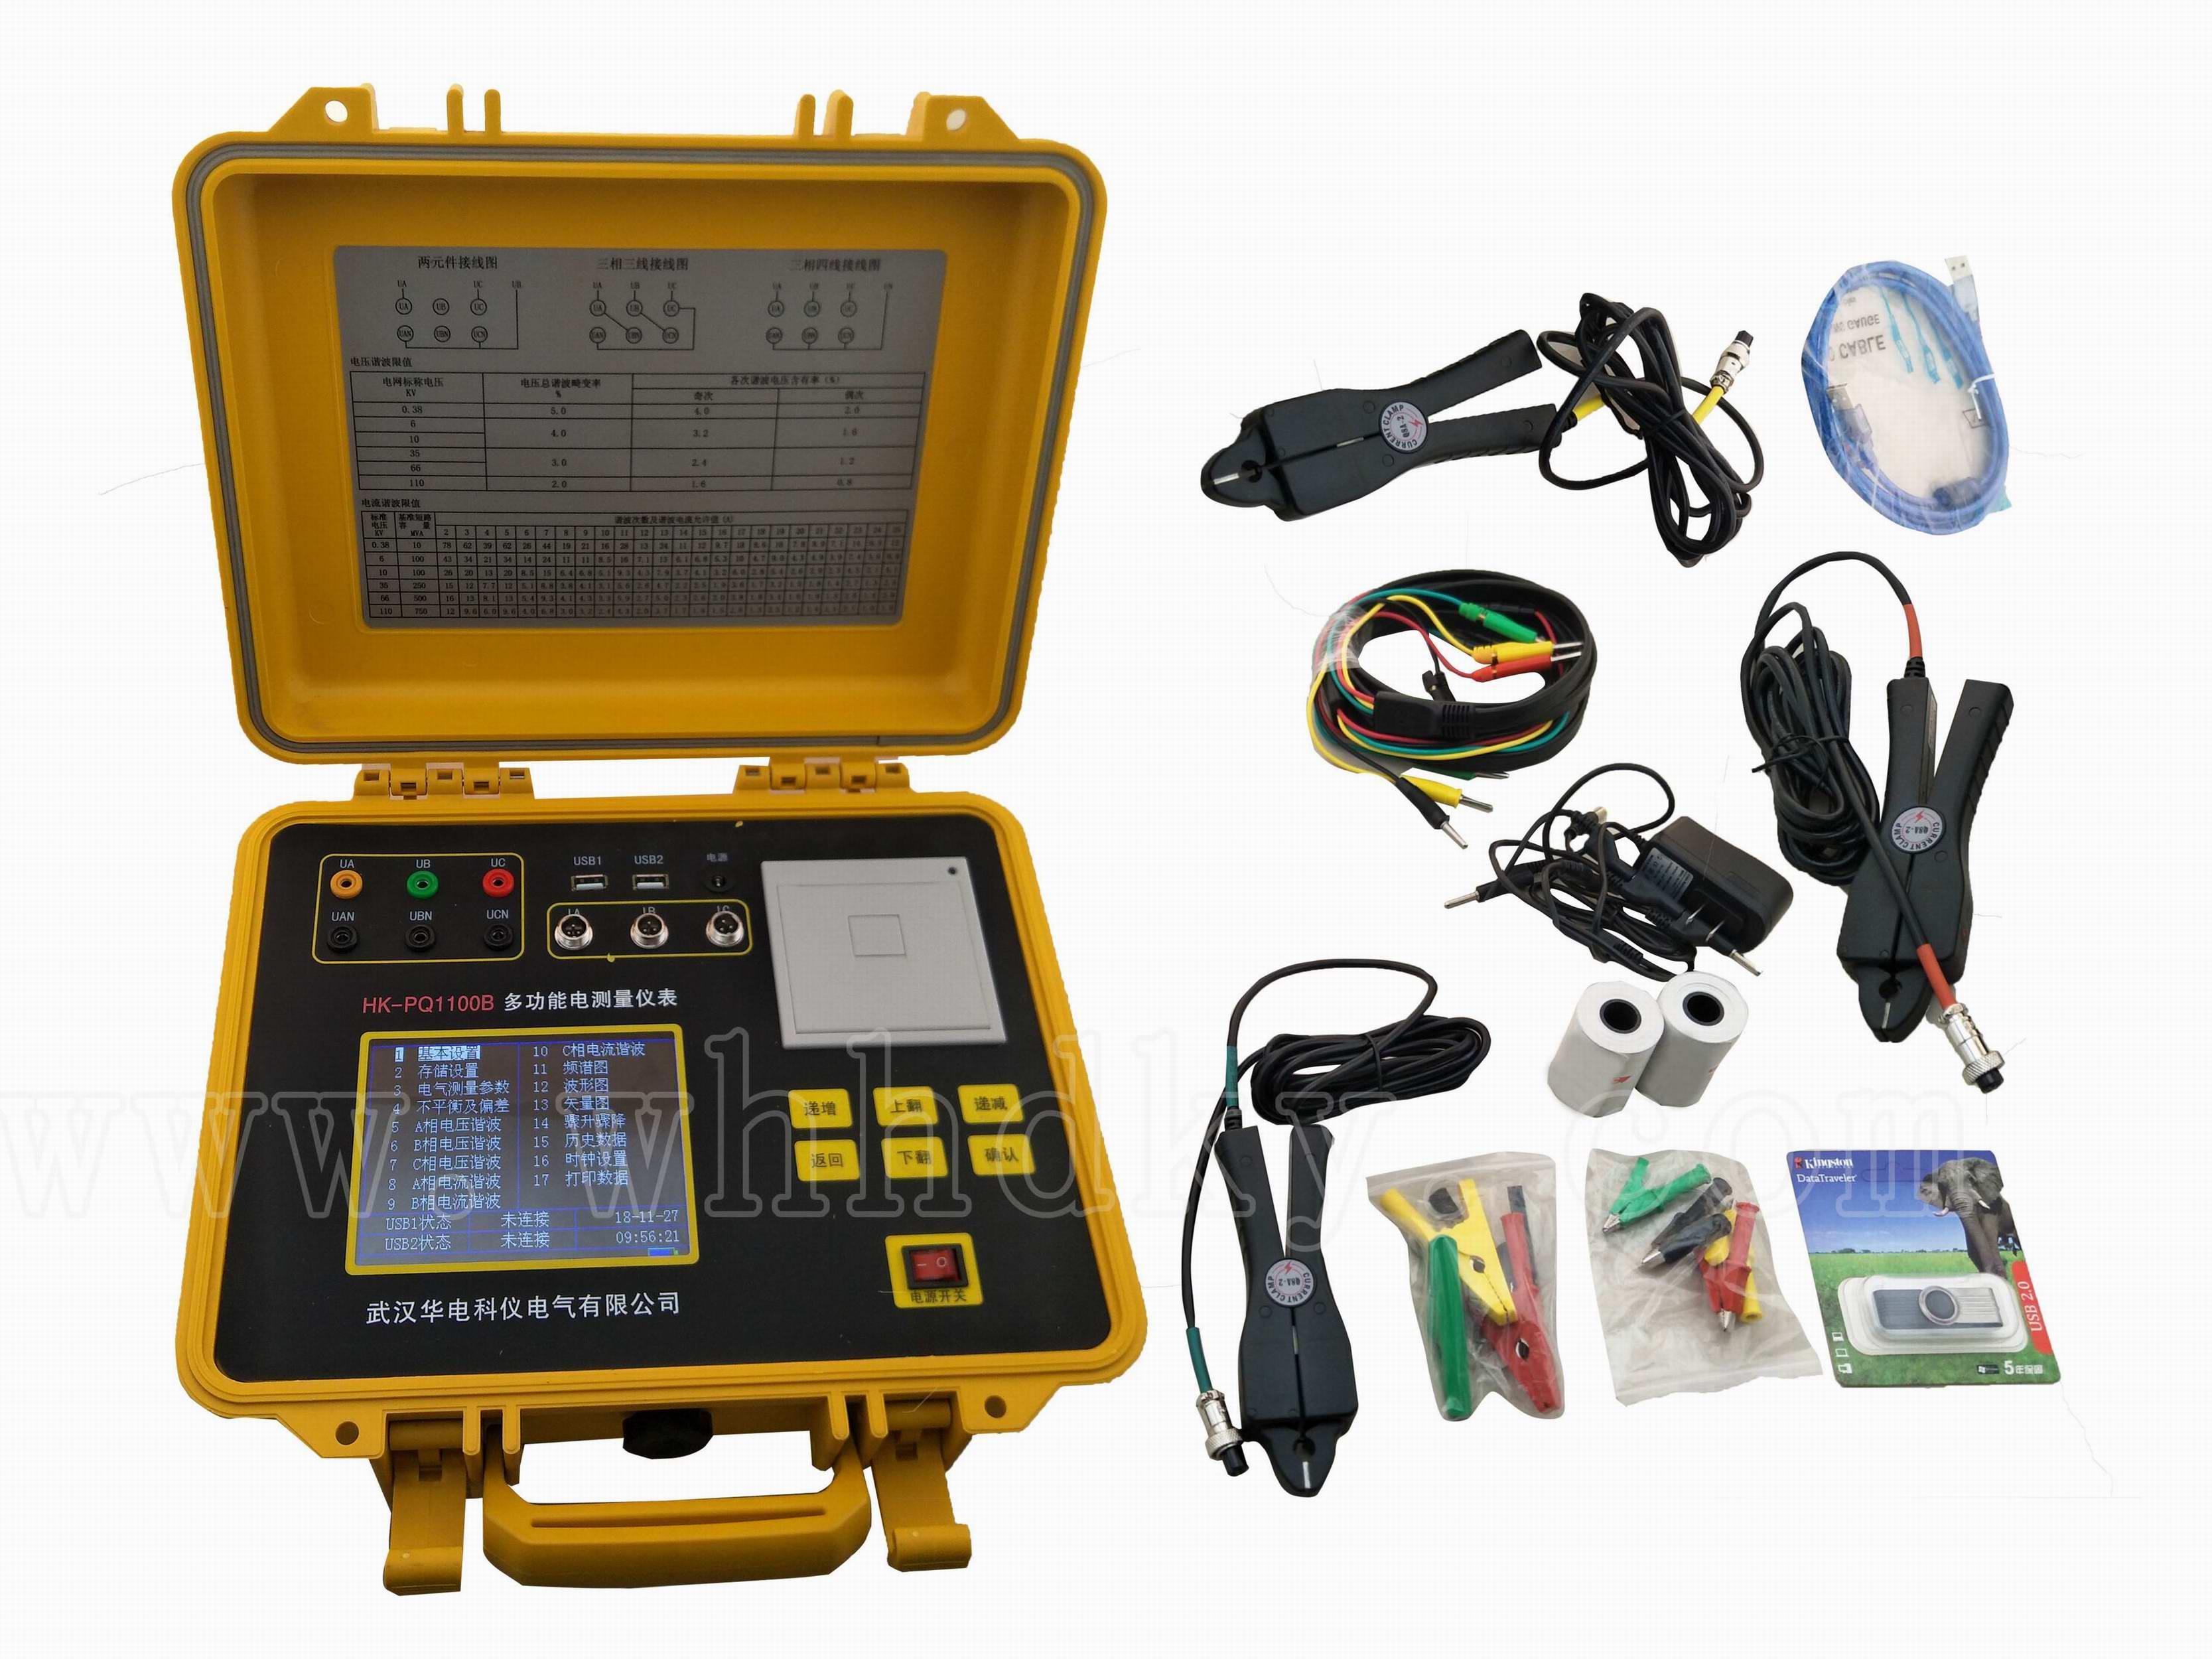 HK-PQ1100B 便携式电能质量分析仪